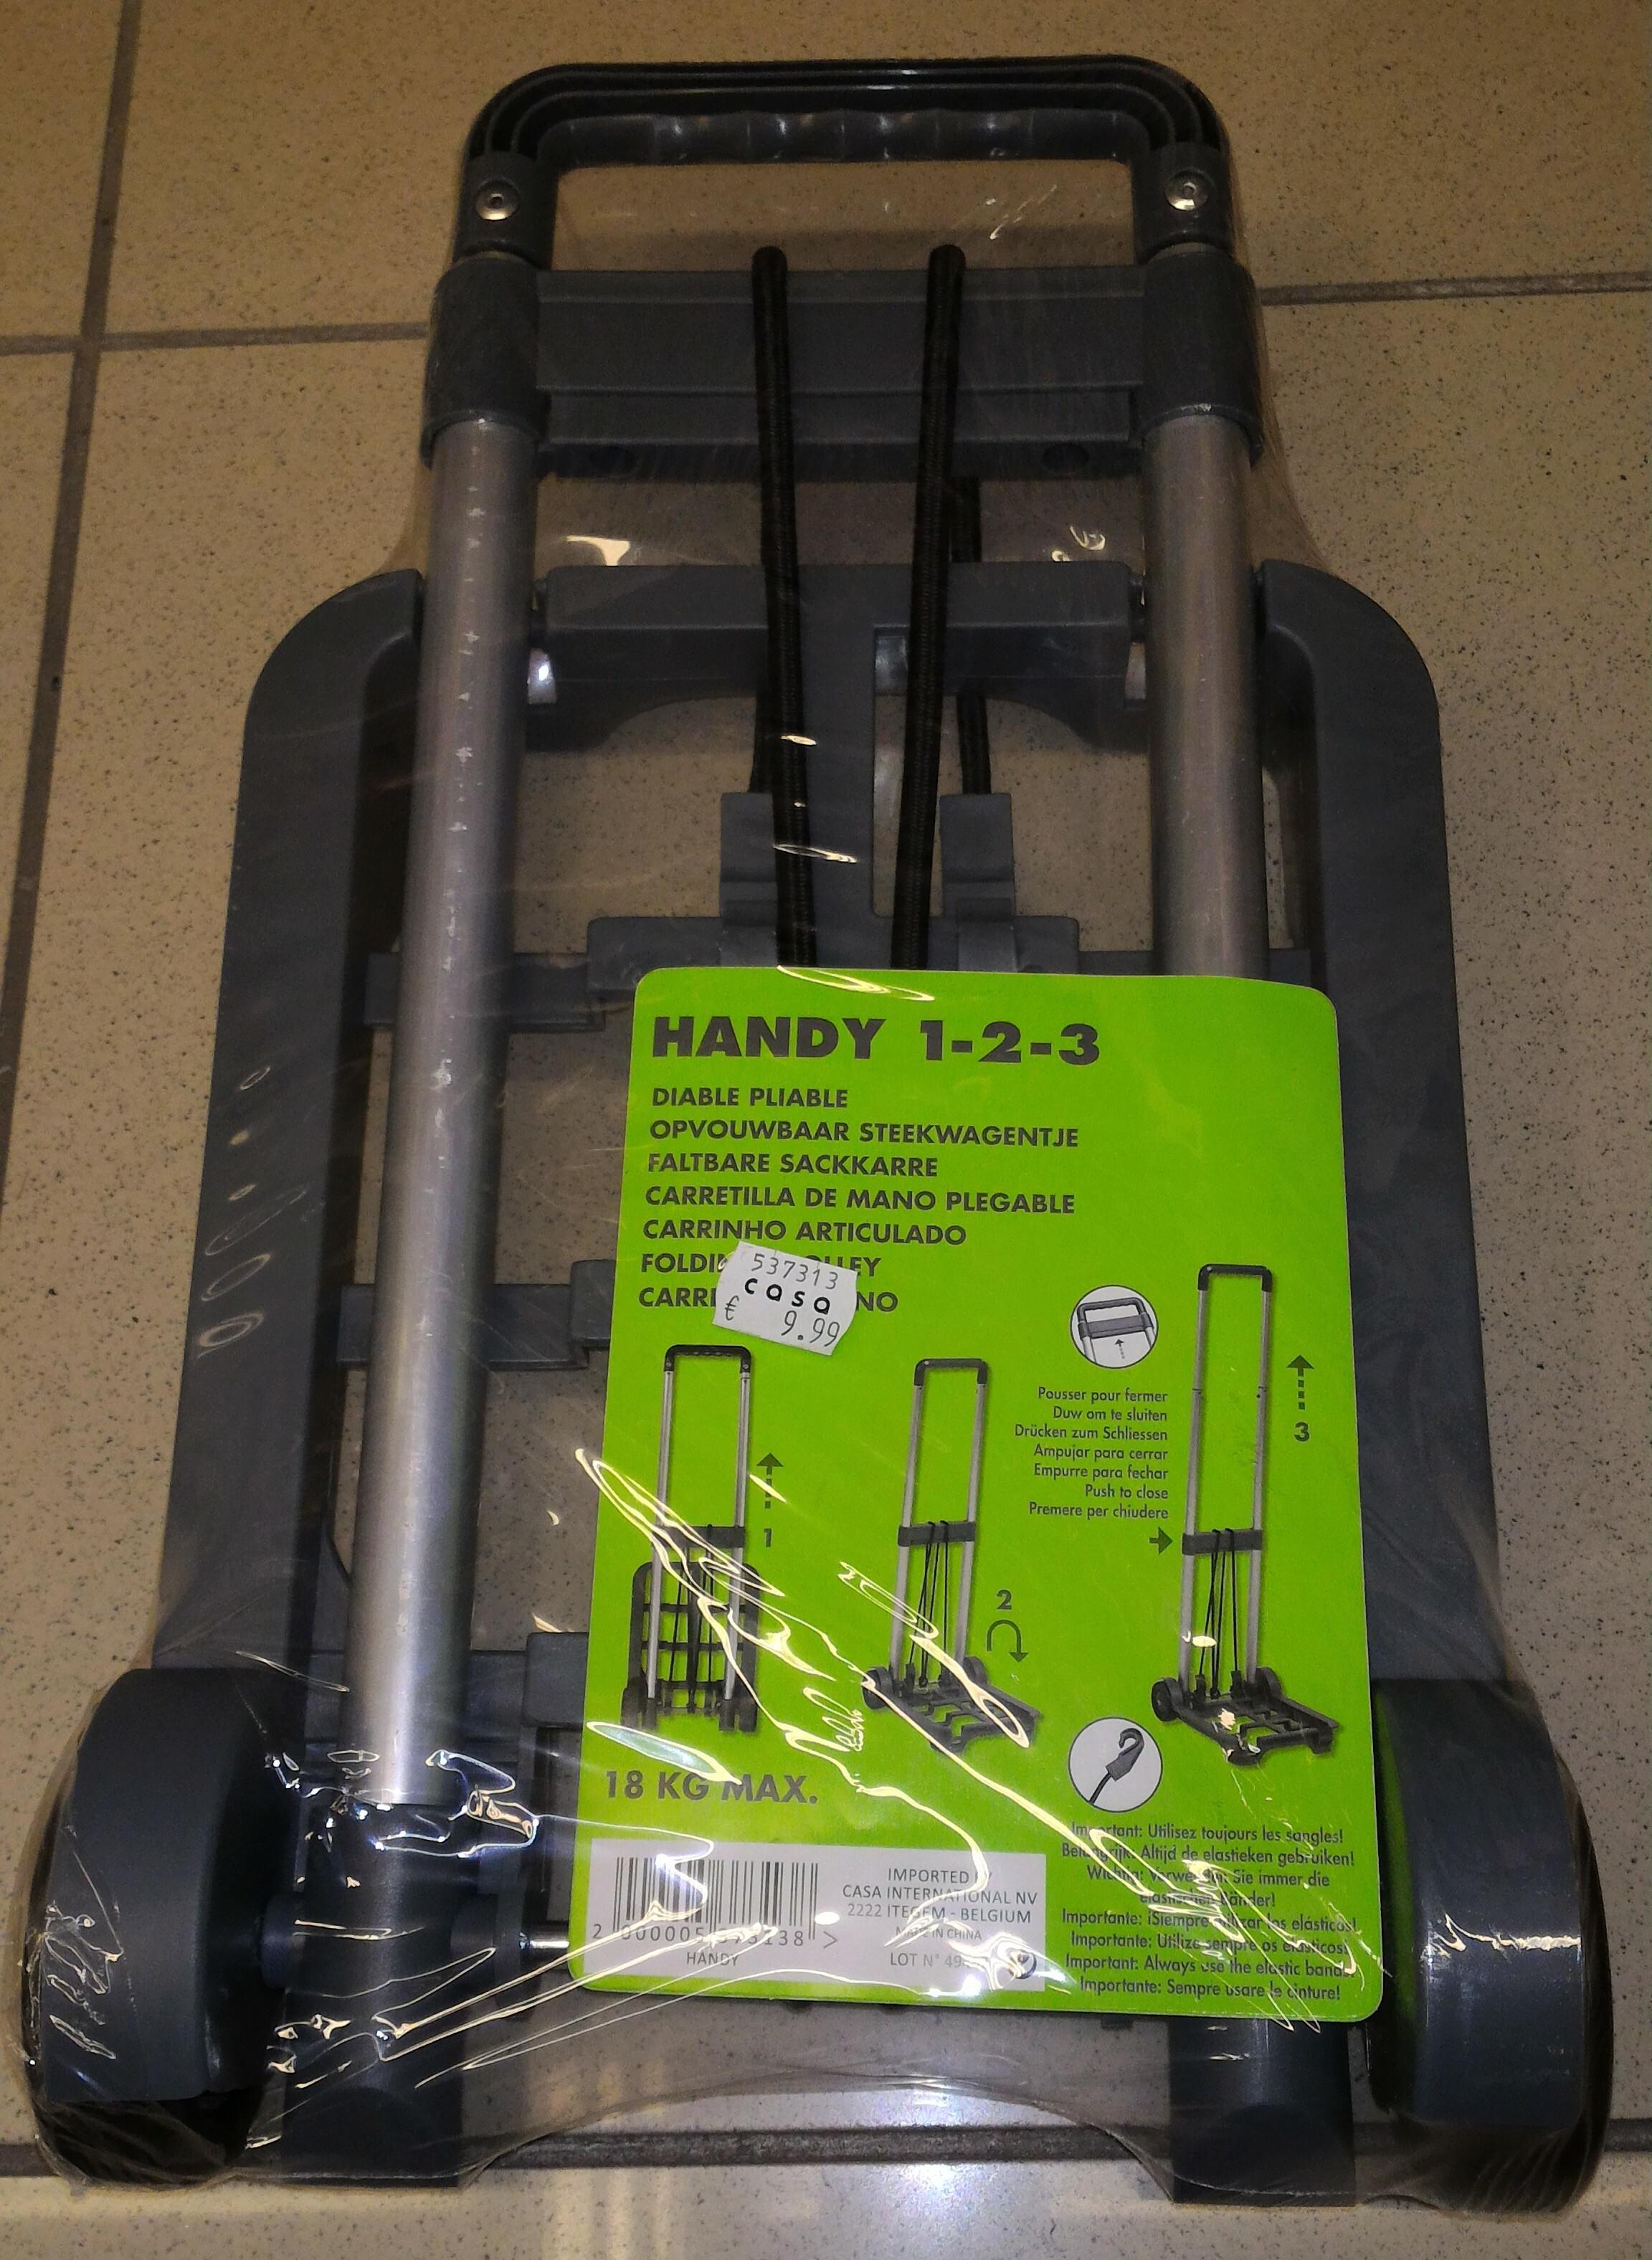 Diable Pliable Handy 1-2-3 - 18Kg max